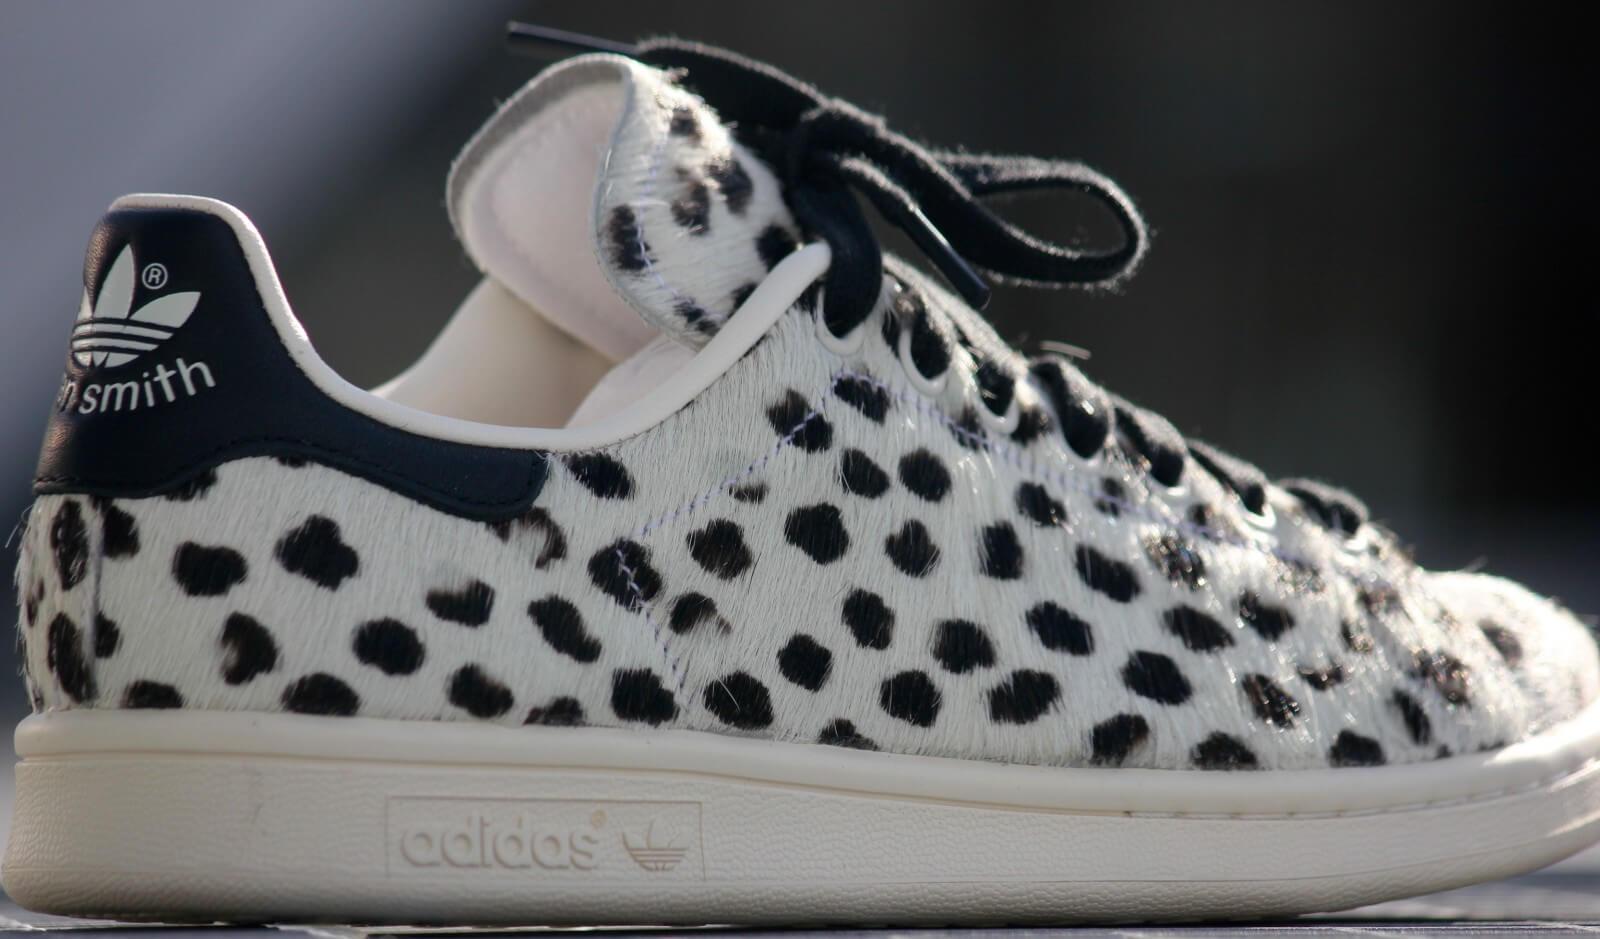 adidas stan smith white leopard print s75117. Black Bedroom Furniture Sets. Home Design Ideas